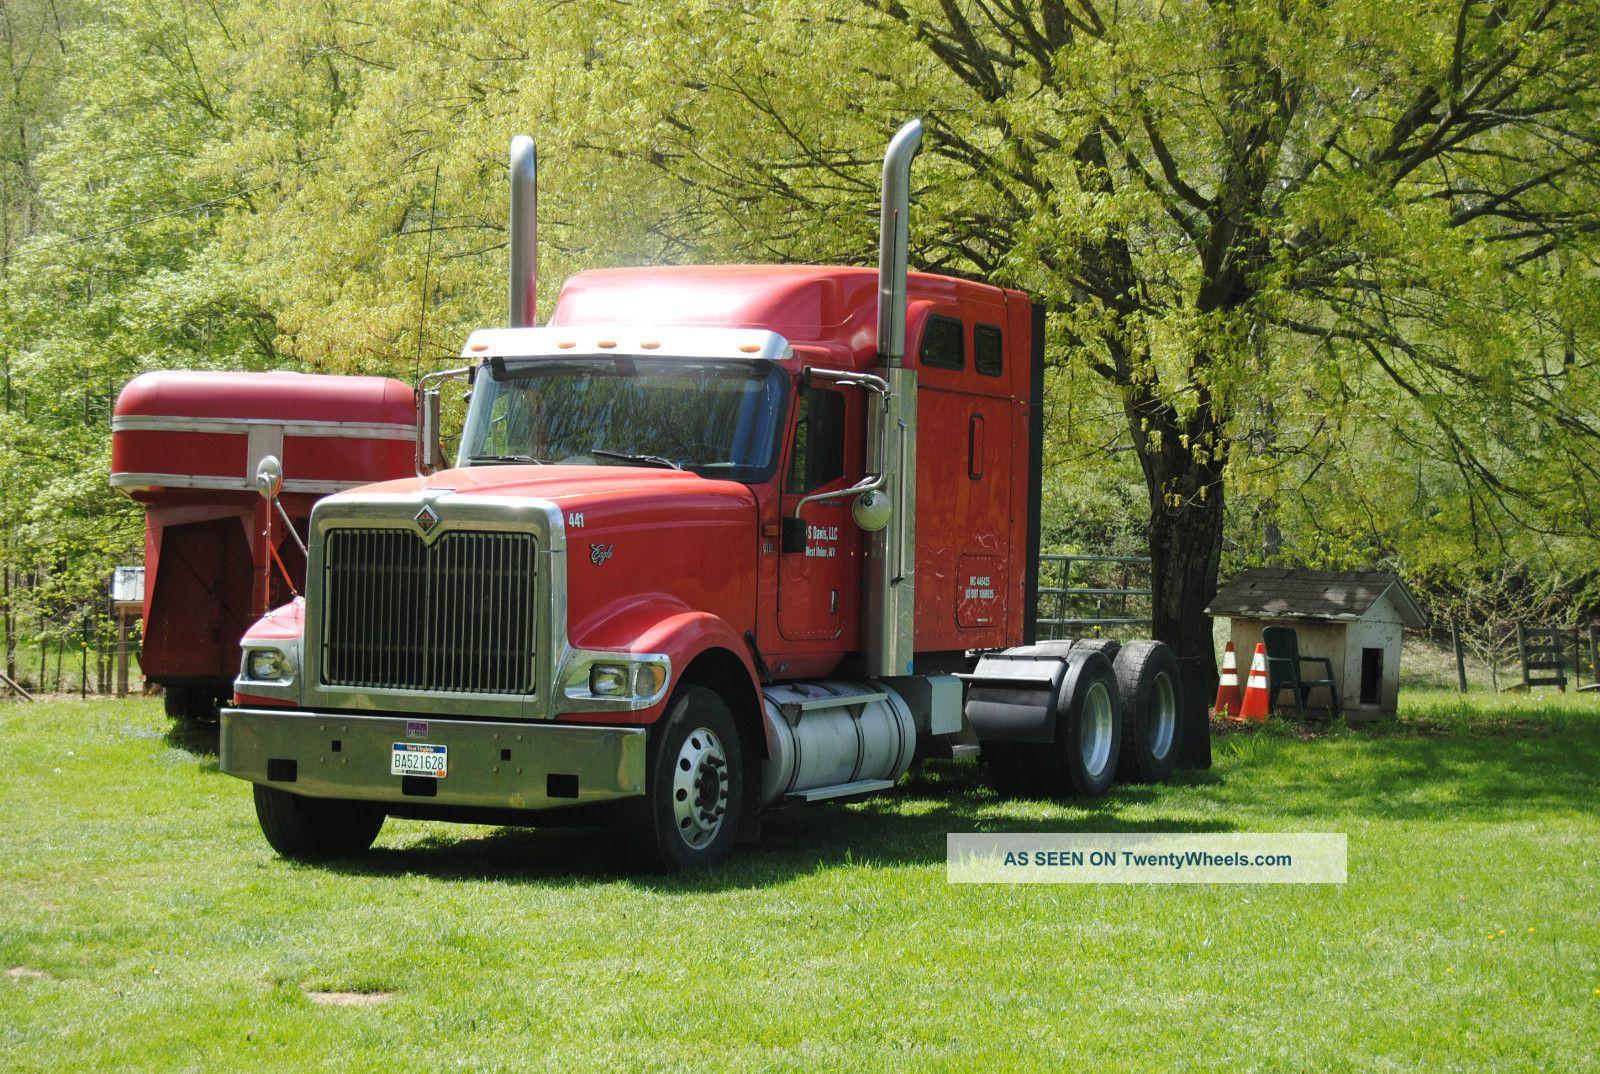 2006 International 9900i Sleeper Semi Trucks photo